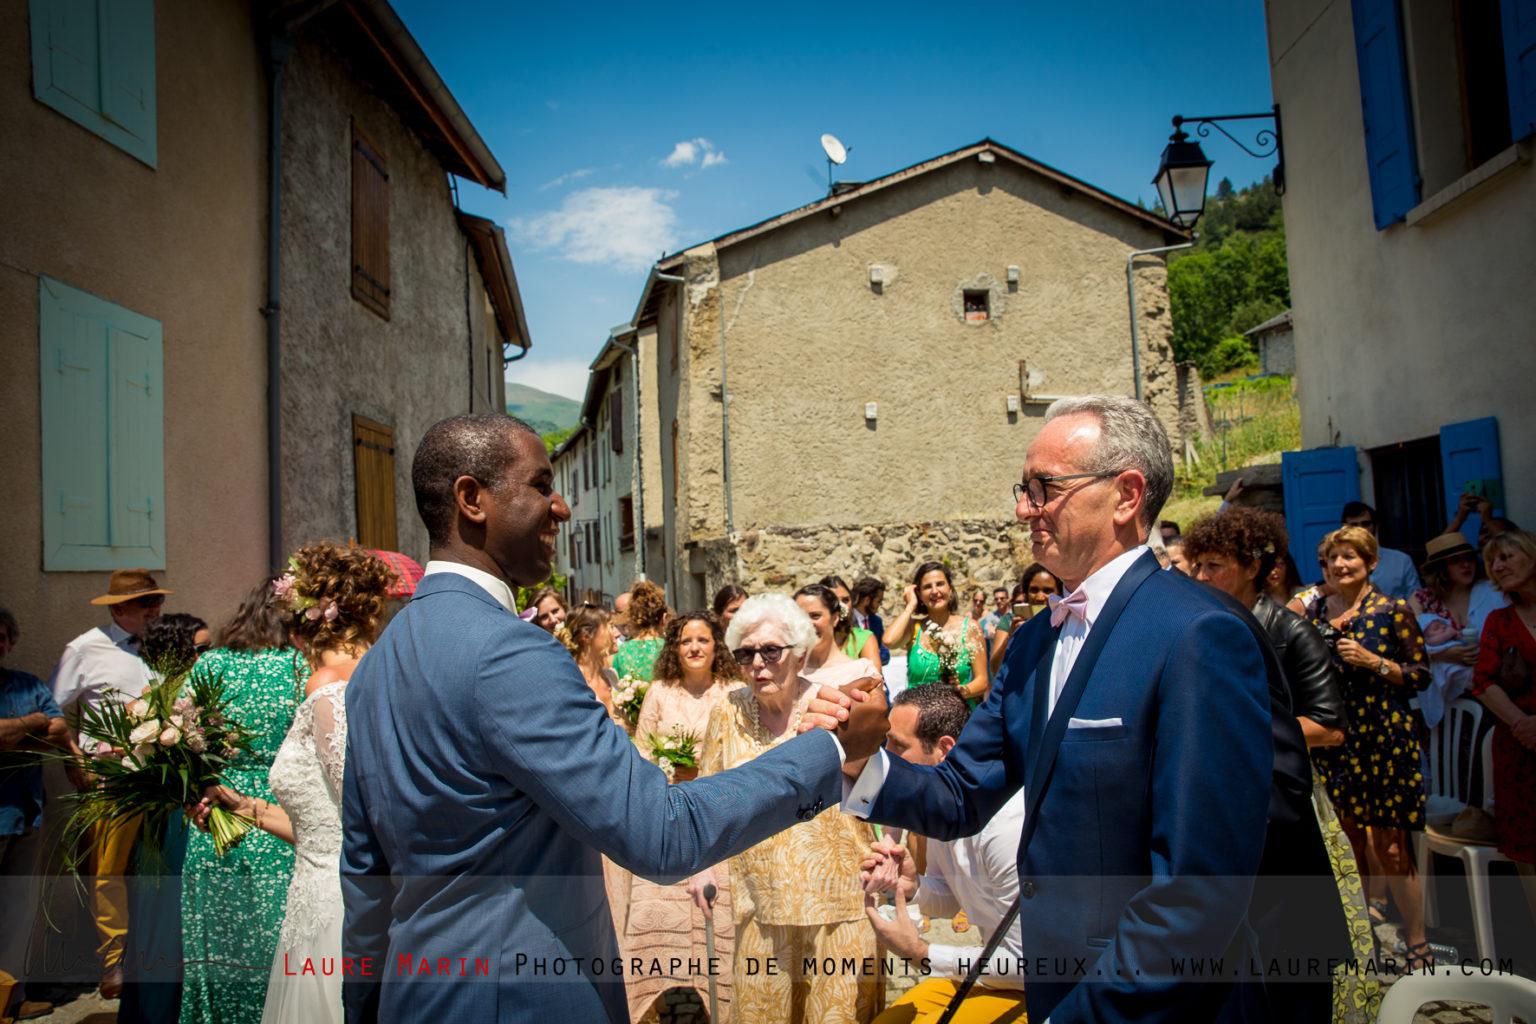 © Laure Marin Photographe Mariage Mairie_24124